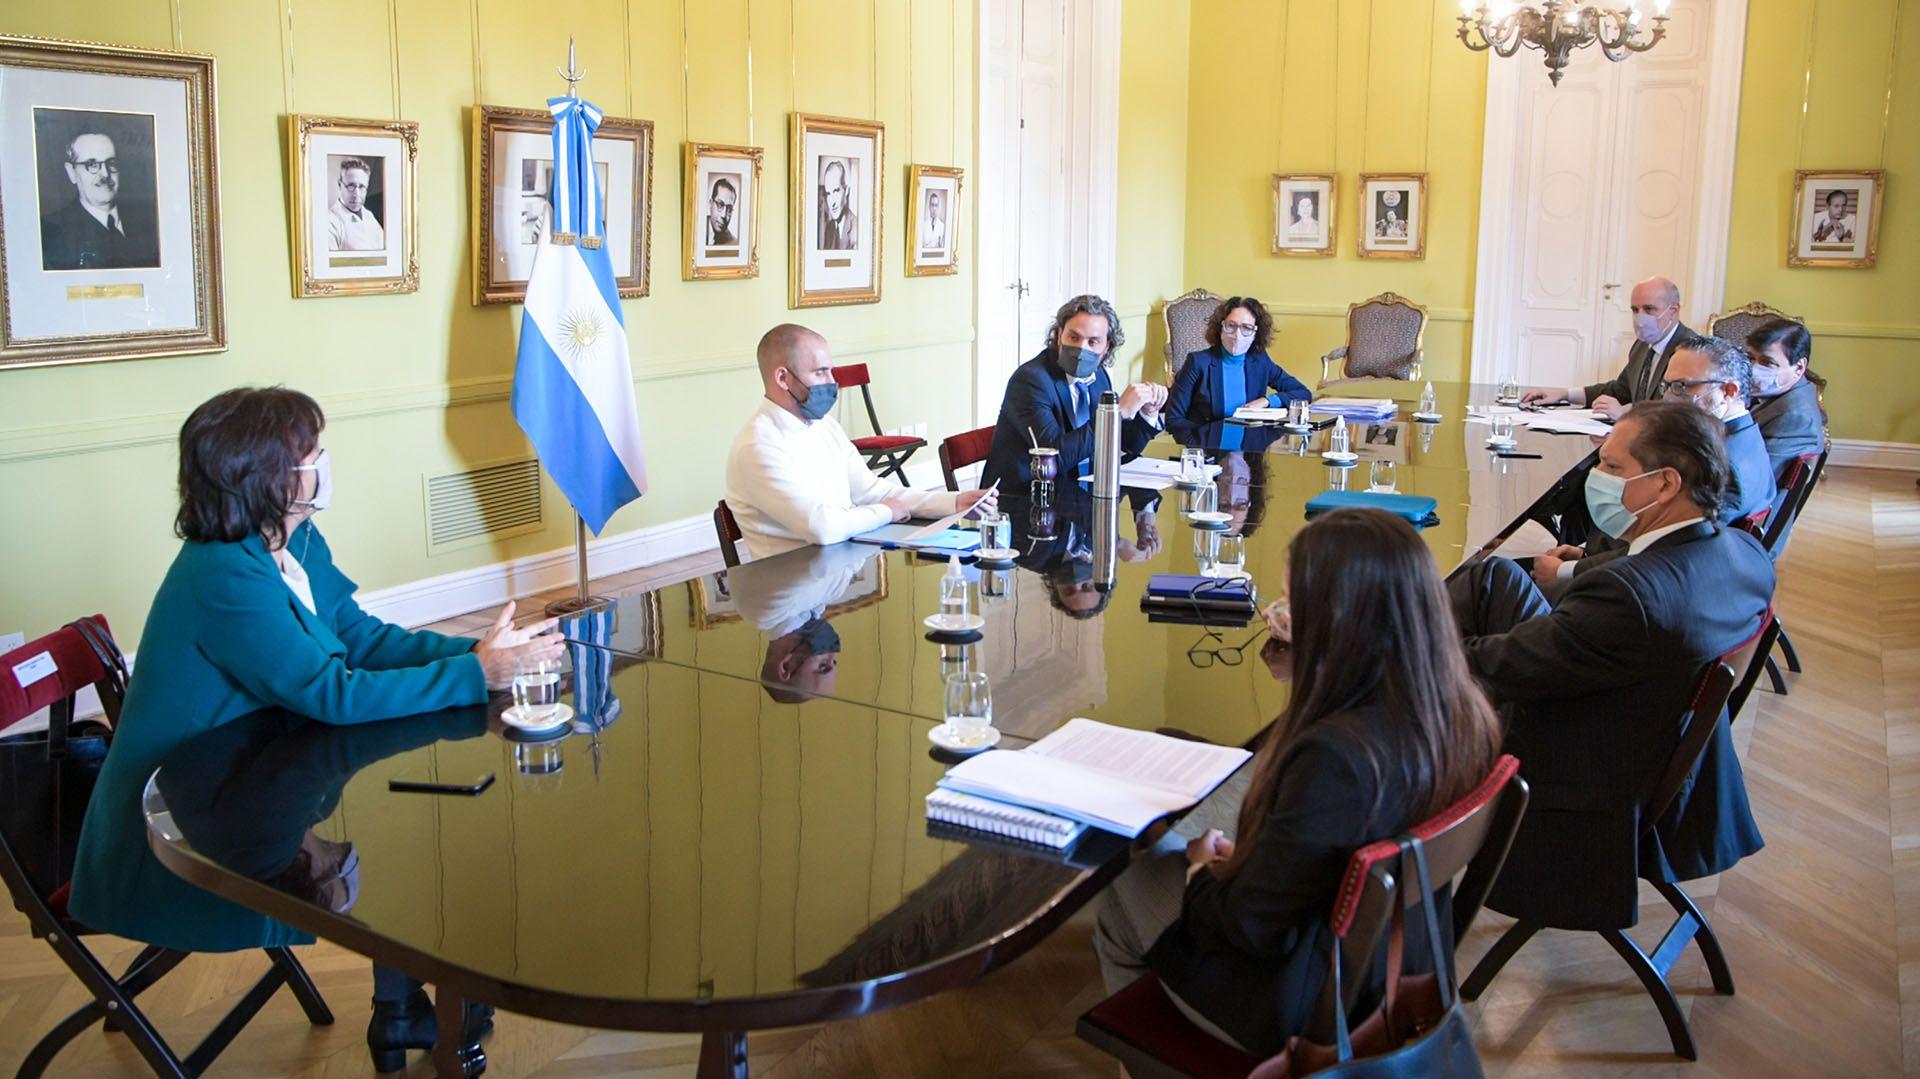 gabinete económico 19-05 Guzmán Cafiero Kulfas